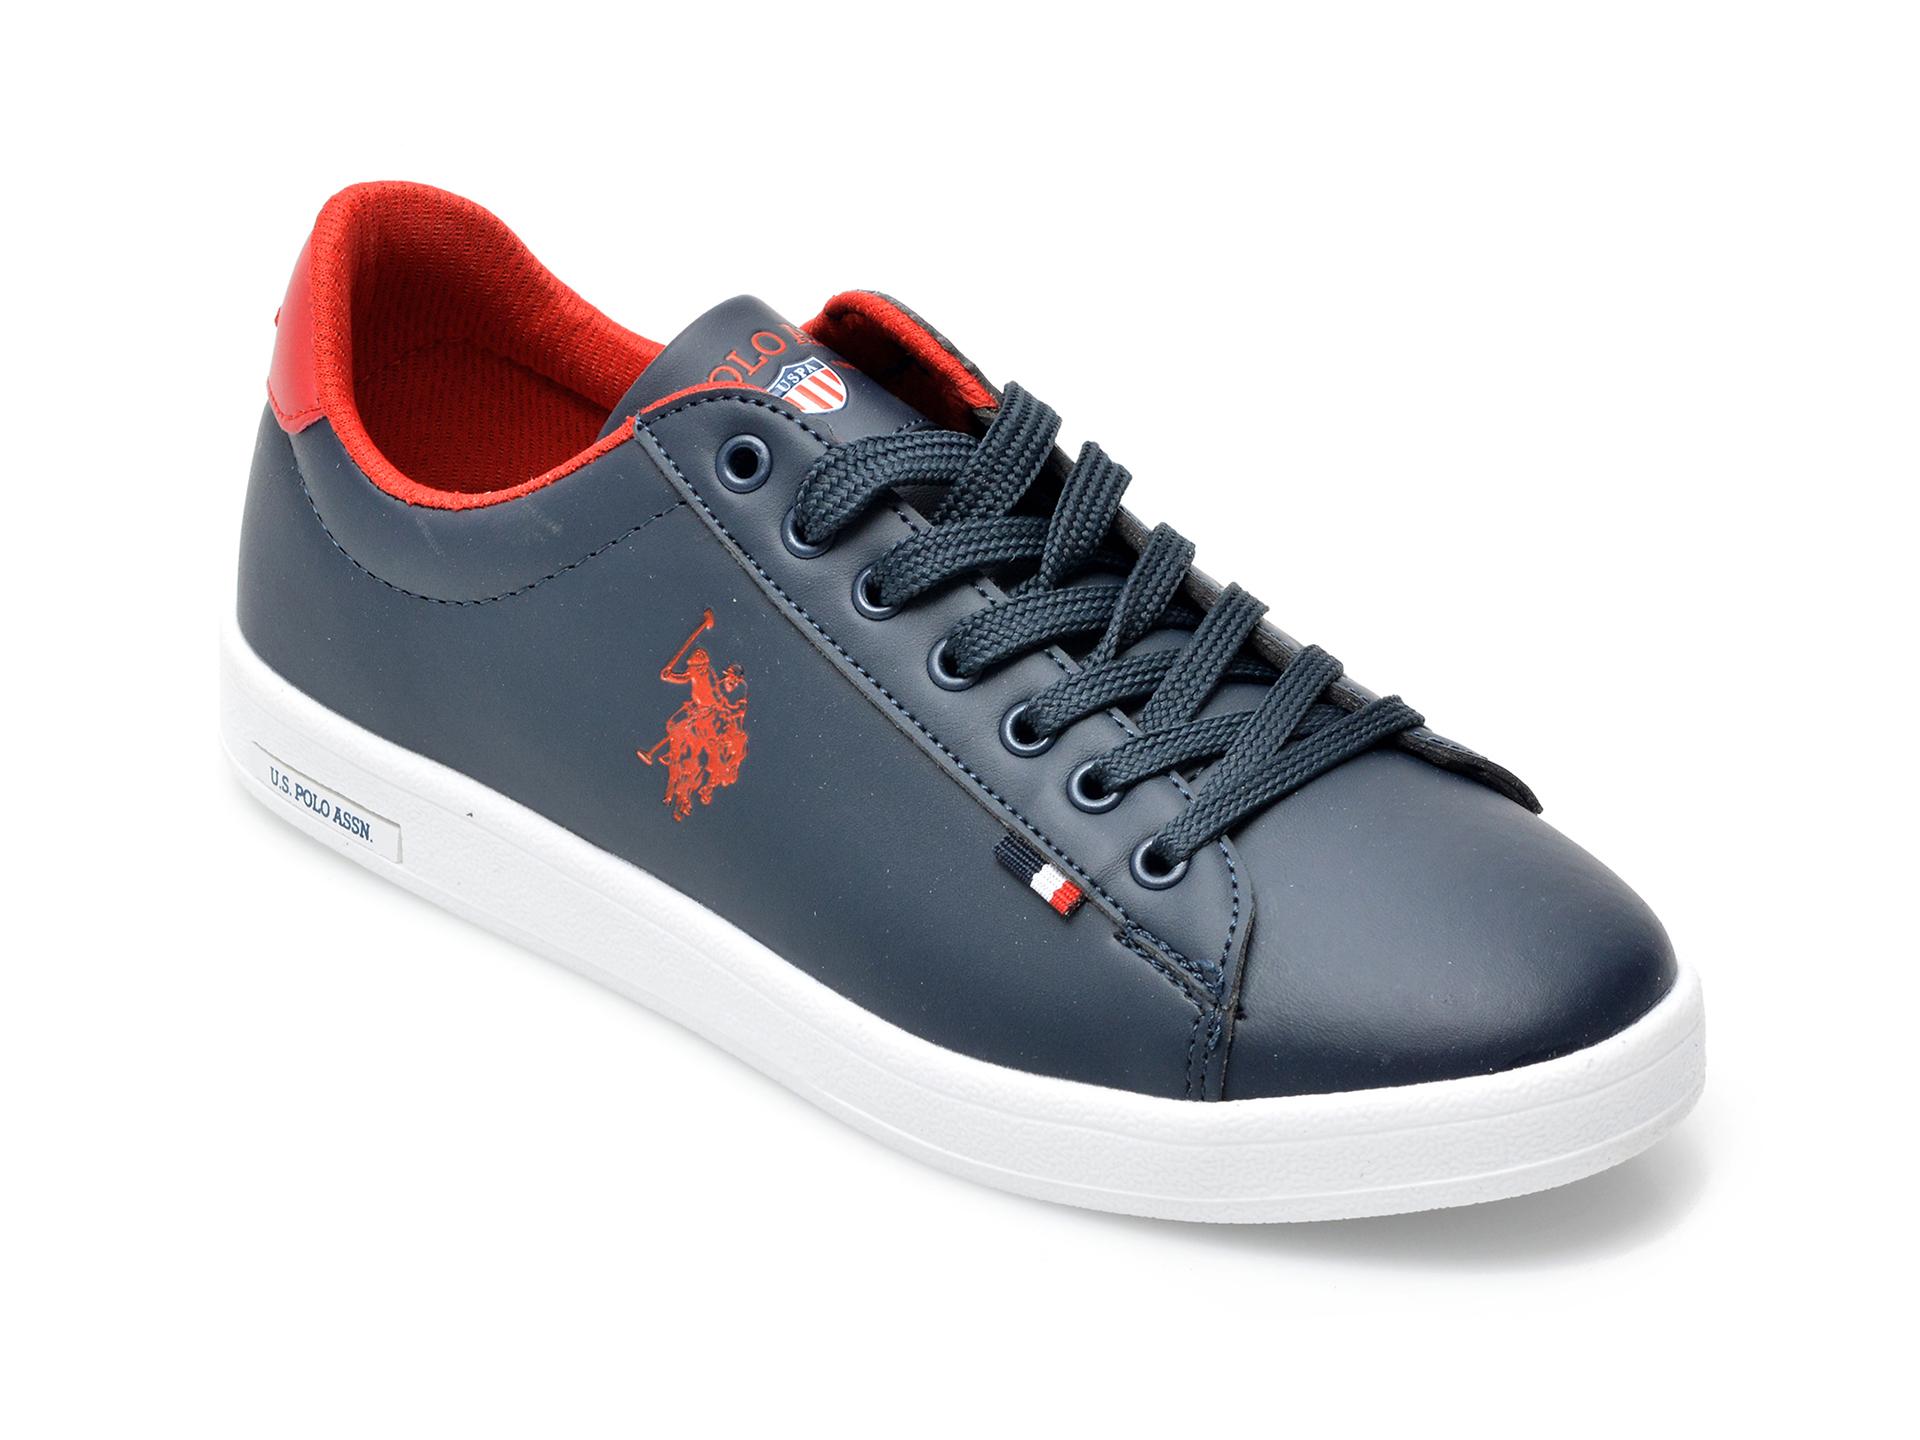 Pantofi sport US POLO ASSN bleumarin, FRAWM1F, din piele ecologica imagine otter.ro 2021